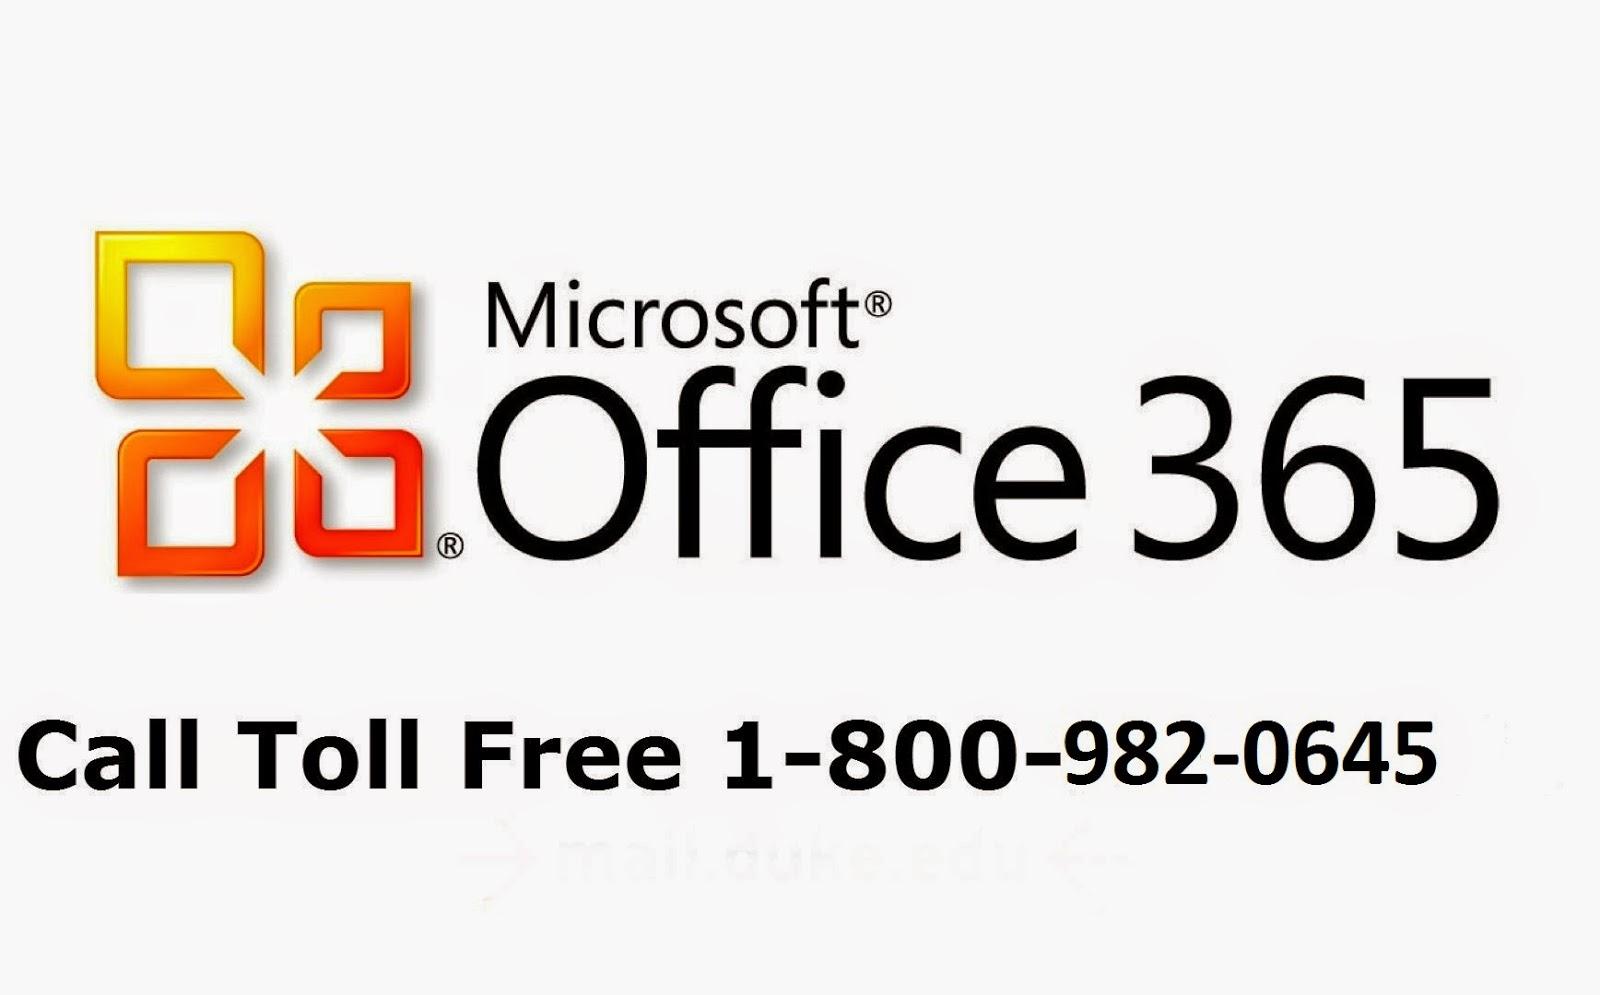 www.office.com/setup 1-800-982-0645 www.office.com/setup 365,office ...